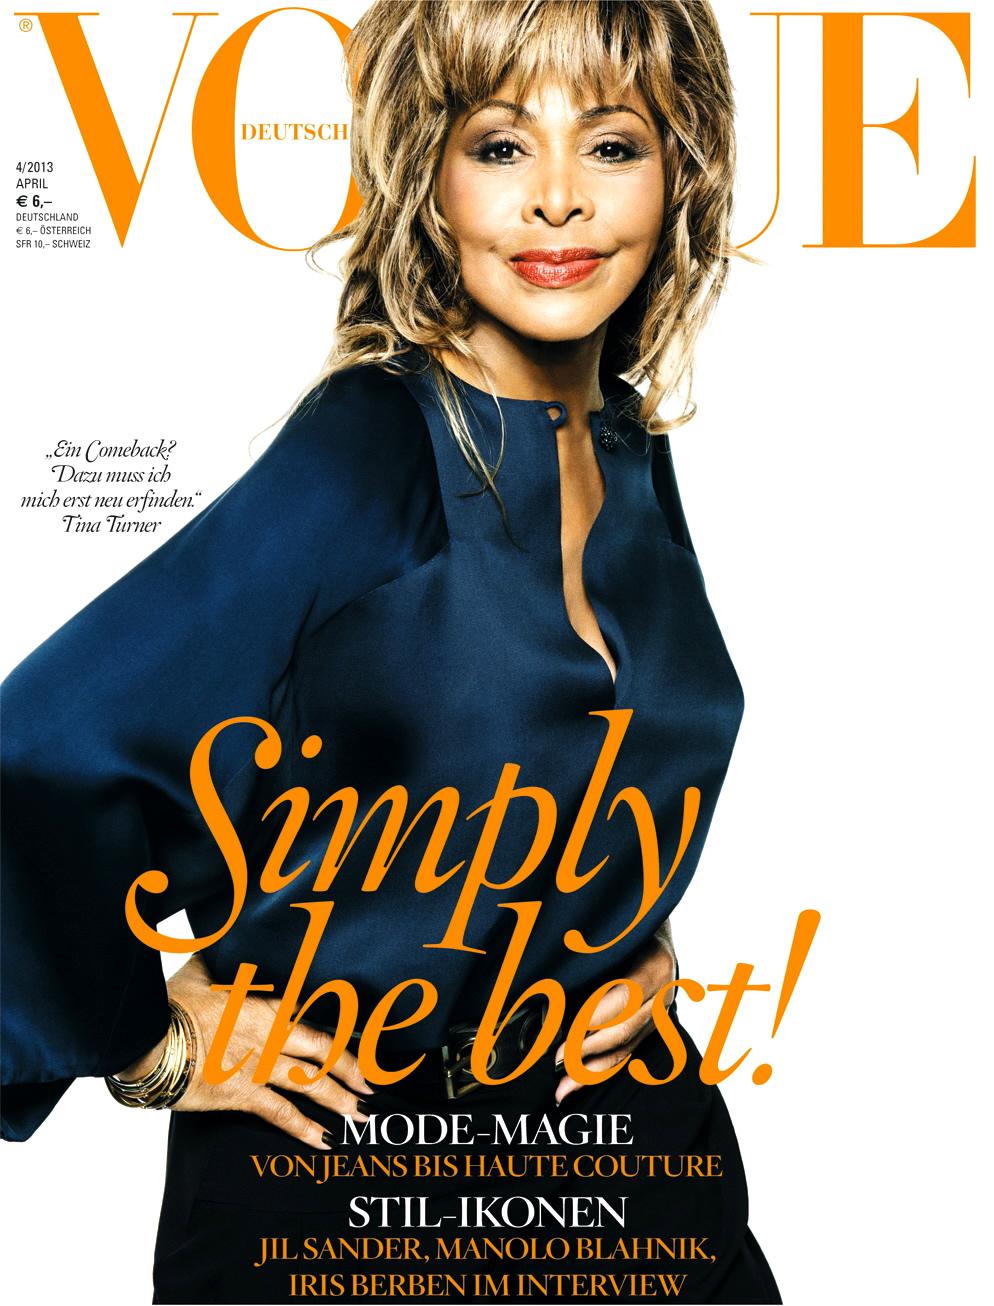 Tina Turner for Vogue Germany